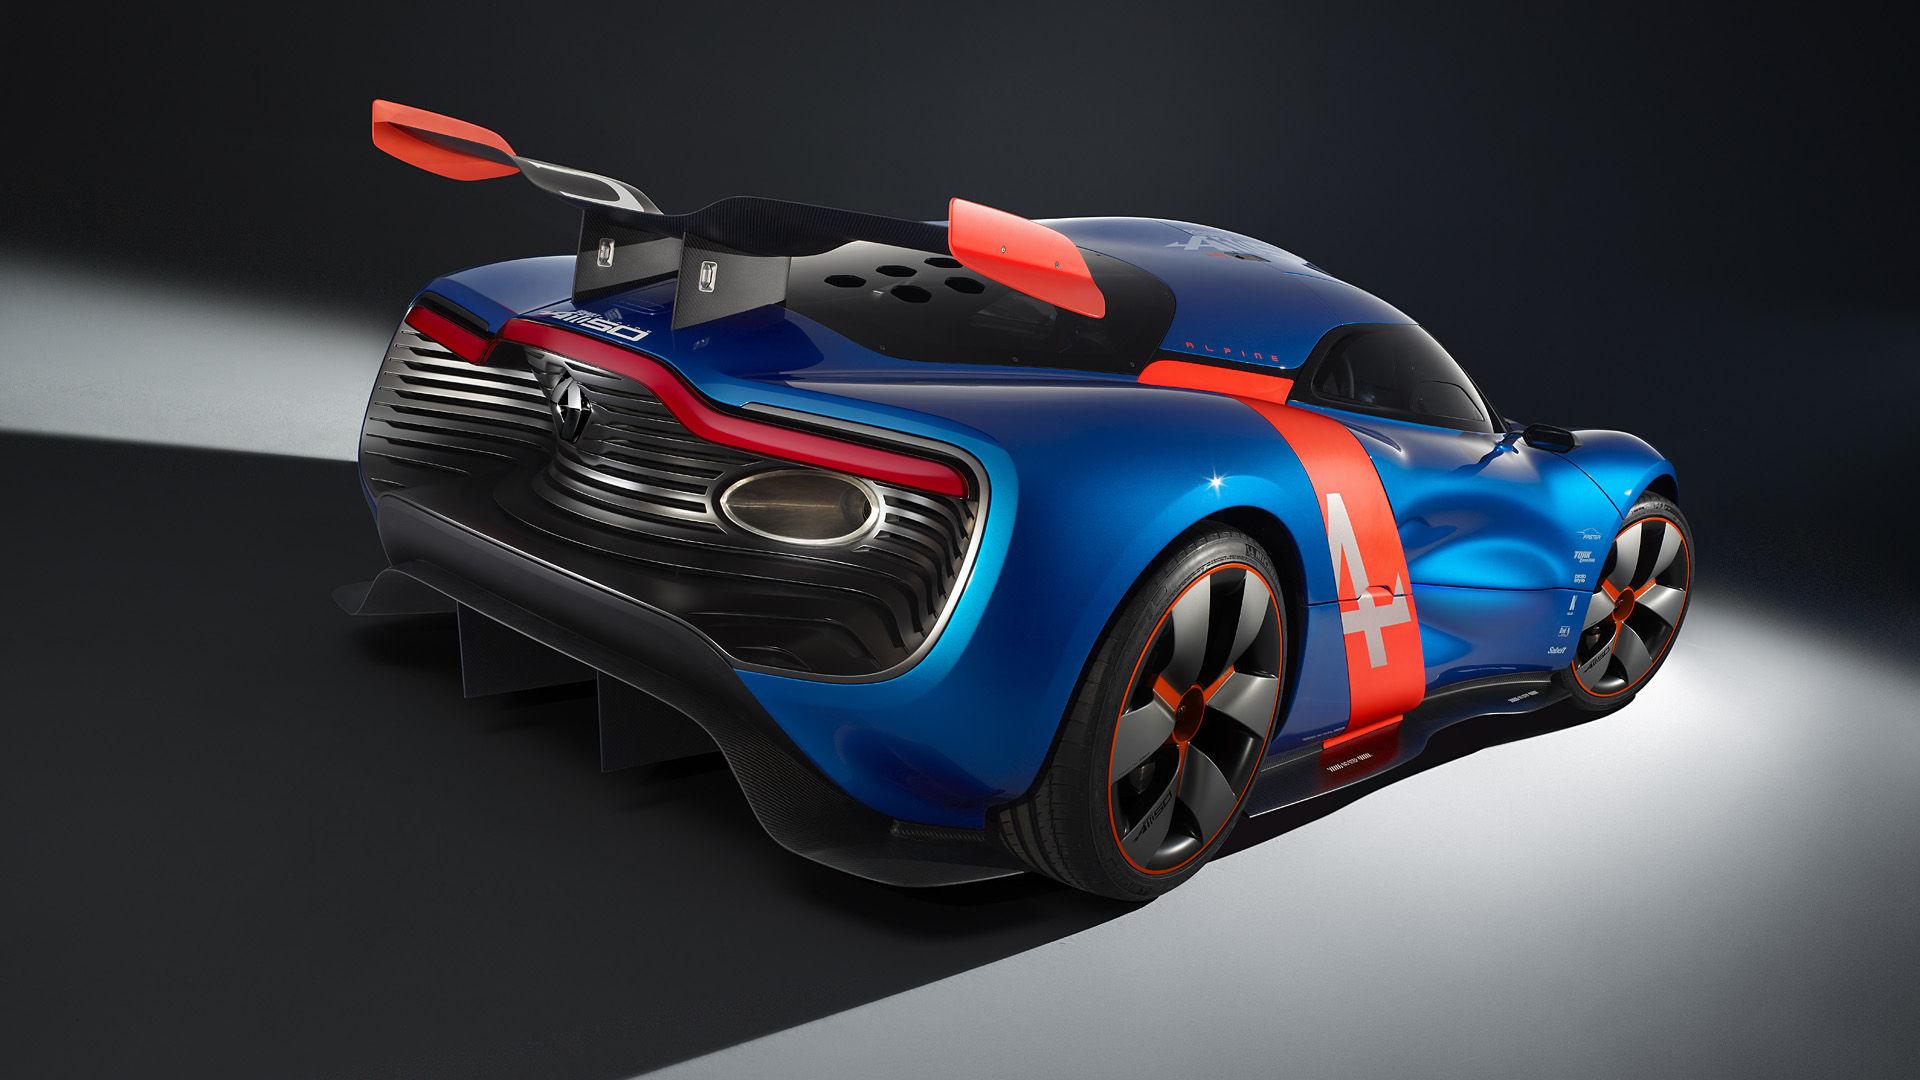 2012 Alpine A 110-50 Concept